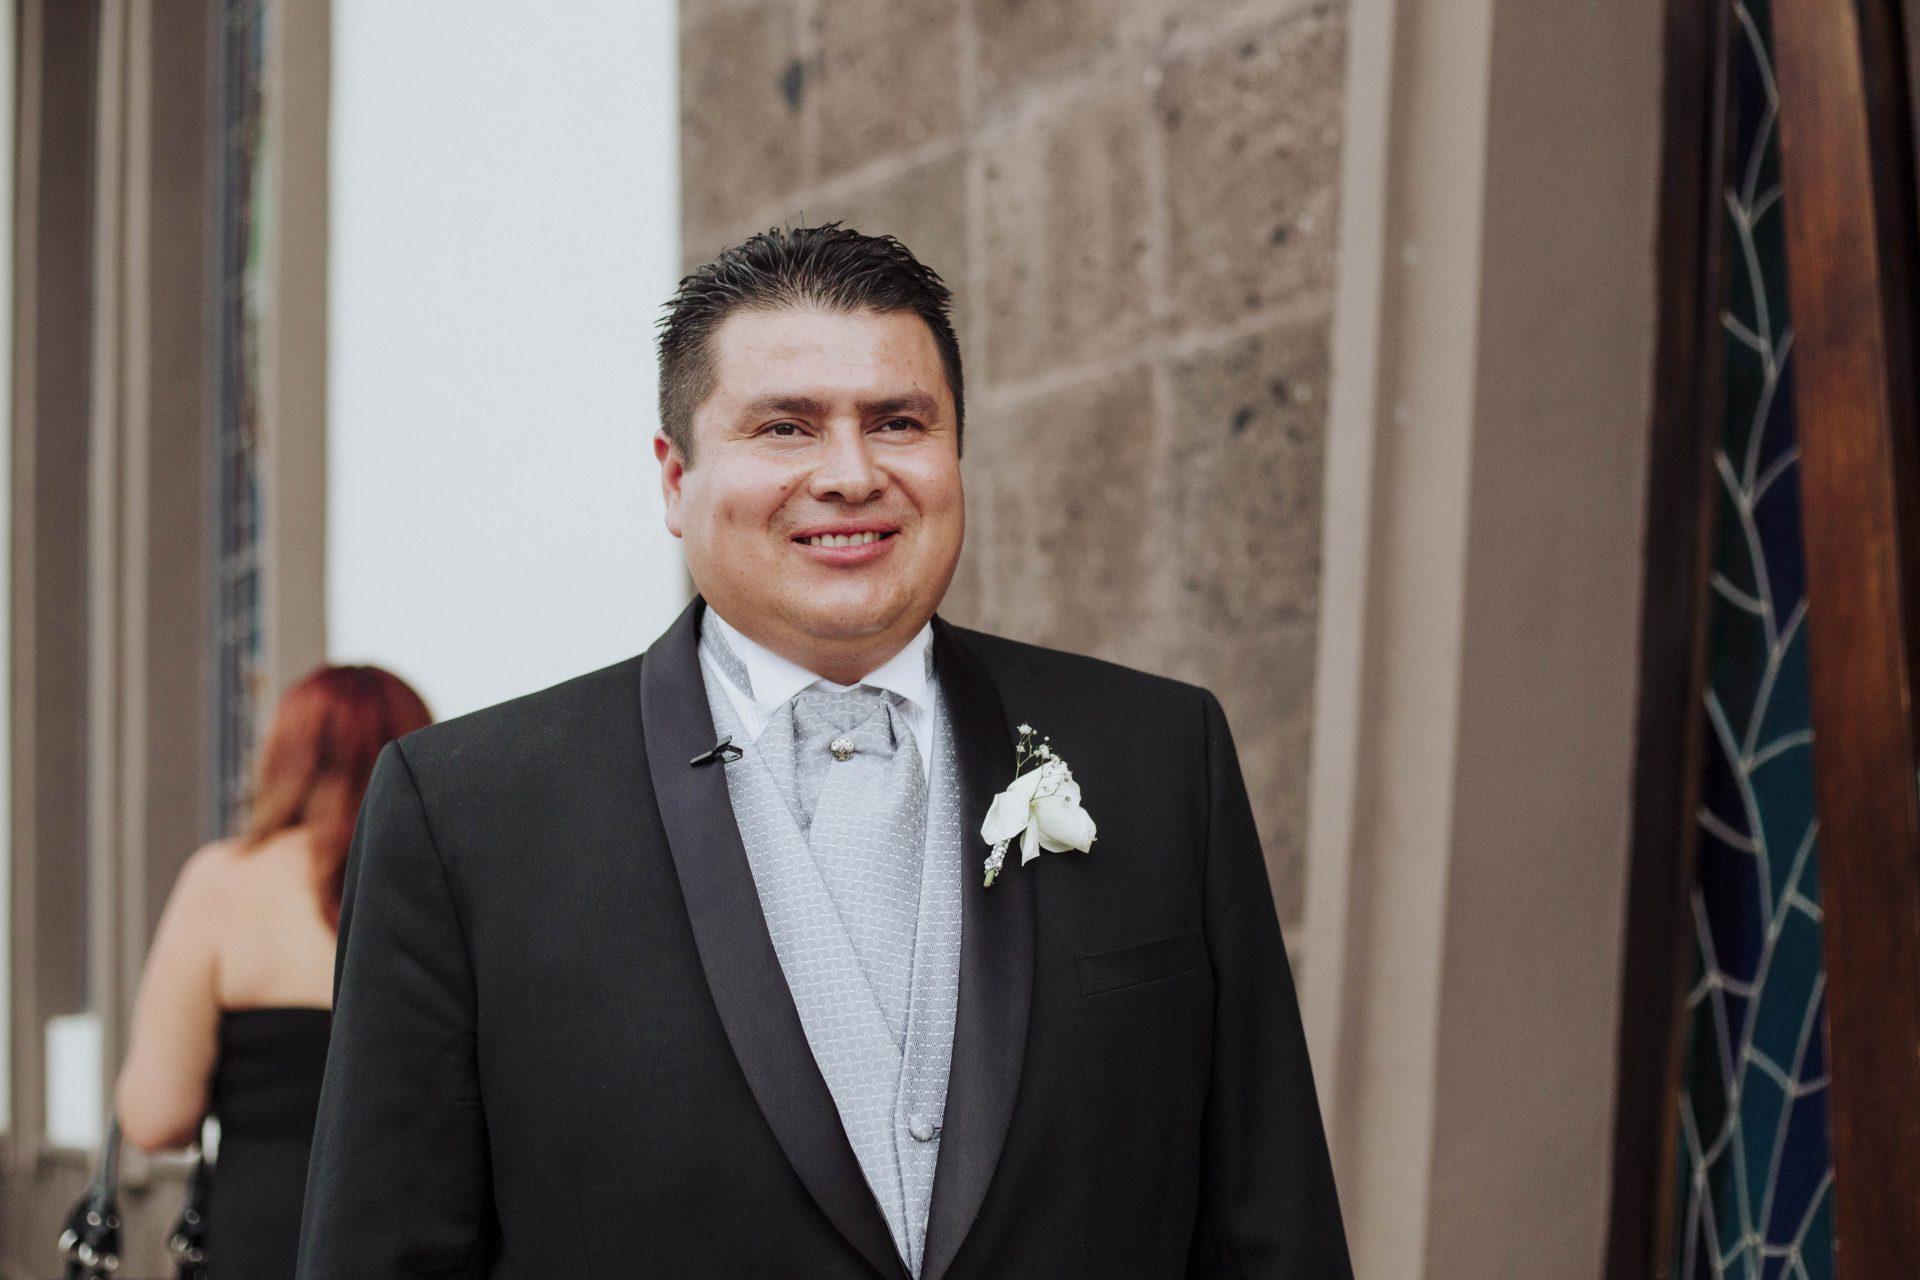 fotografo_profesional_zacatecas_chihuahua_bodas_xv_mexico-38